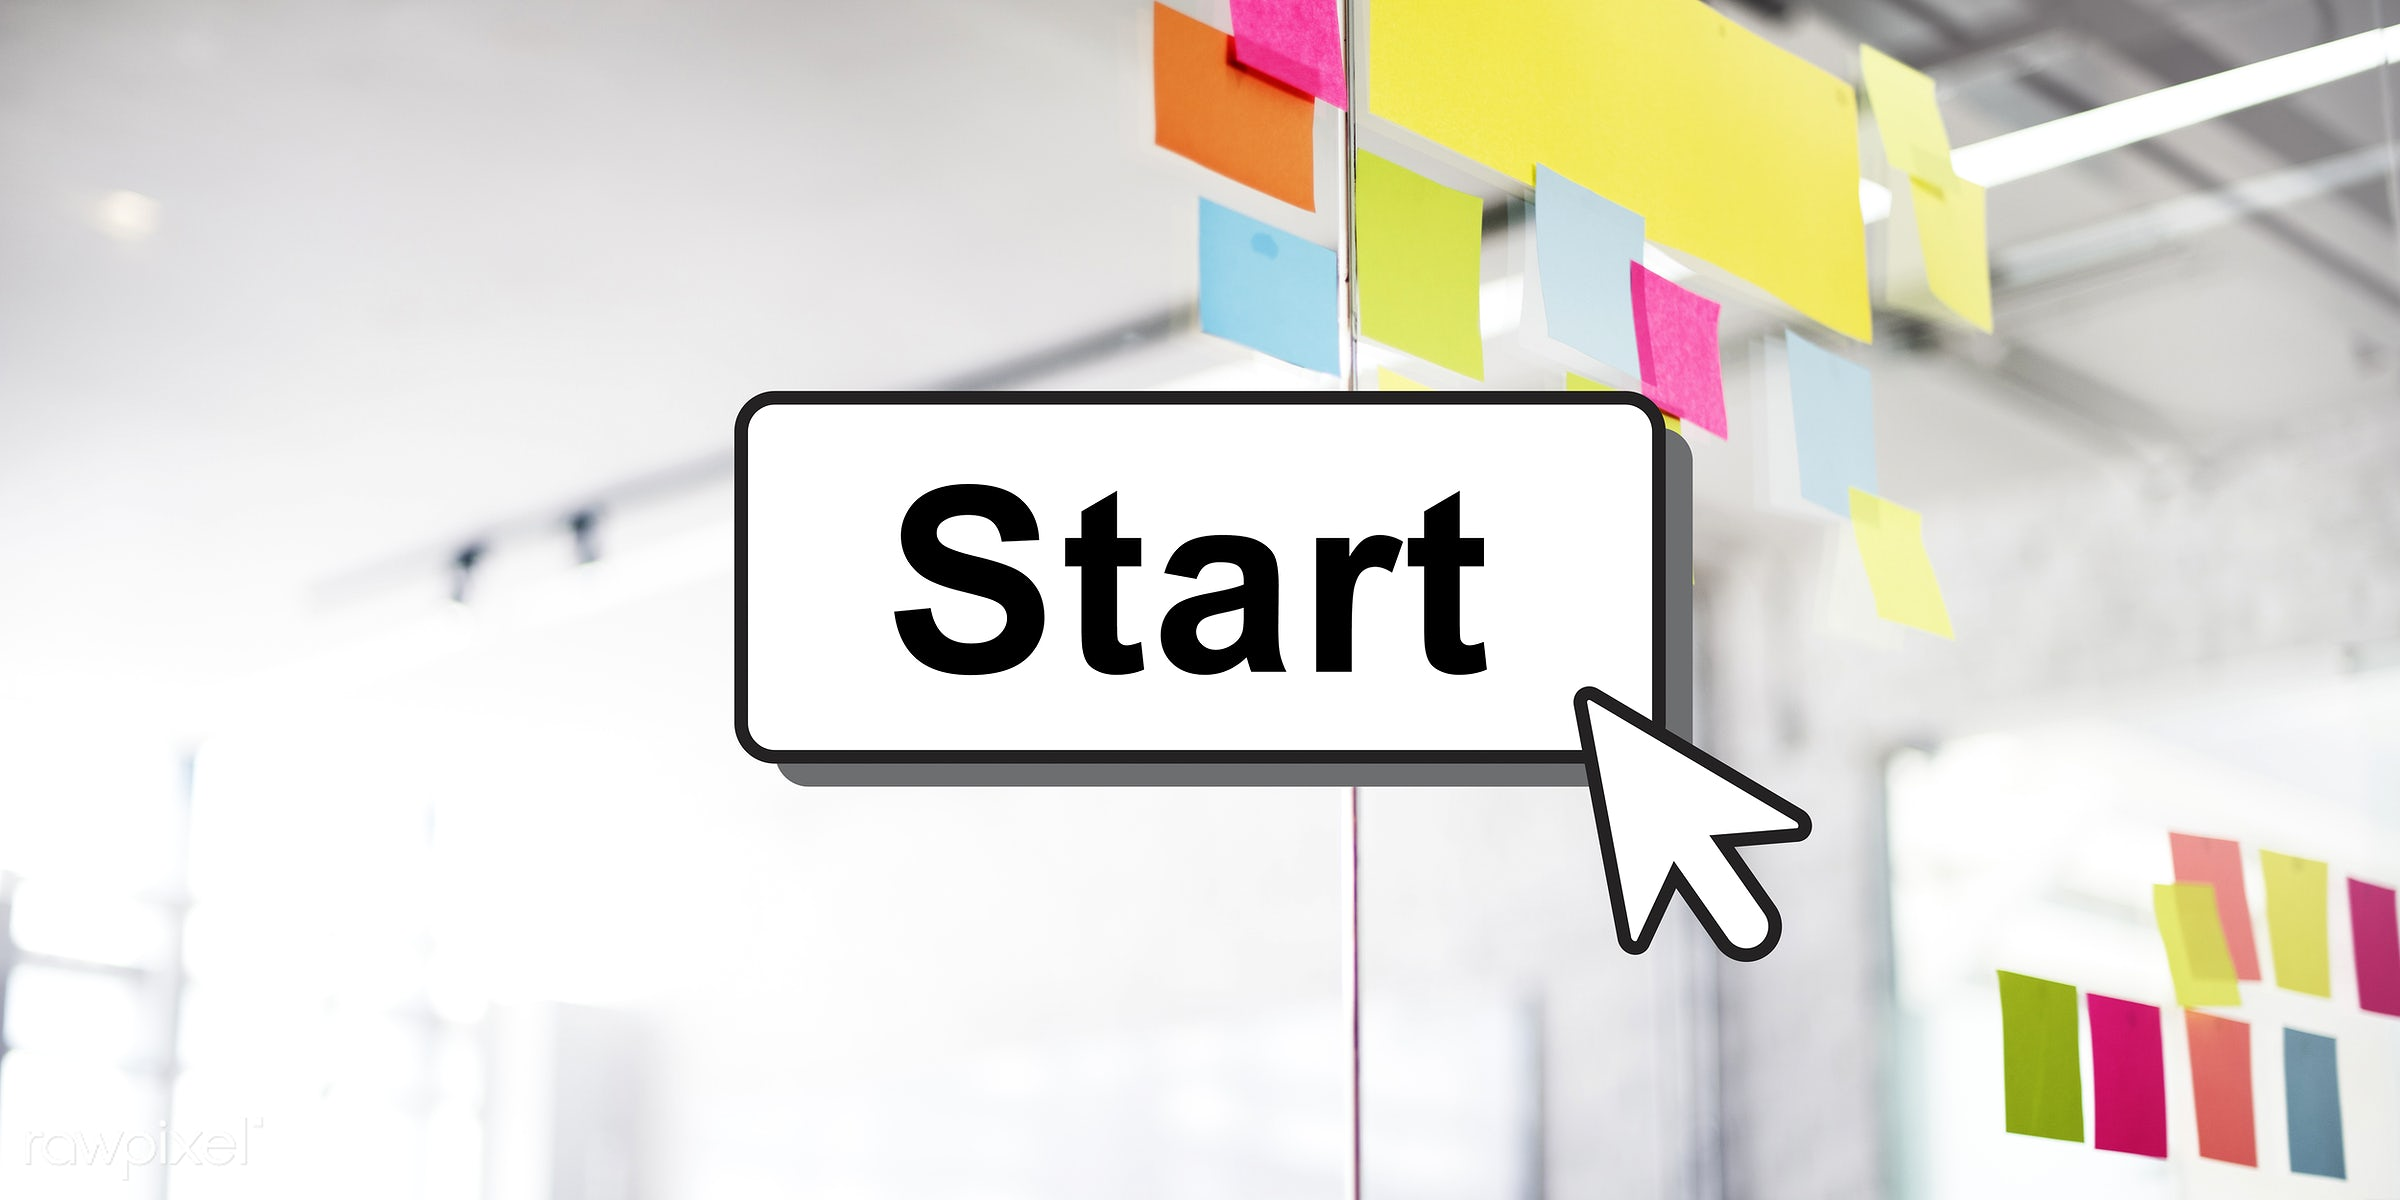 Start - start, begin, schedule, start up, starting, activation, beginning, build, business, colorful, creative, creativity,...